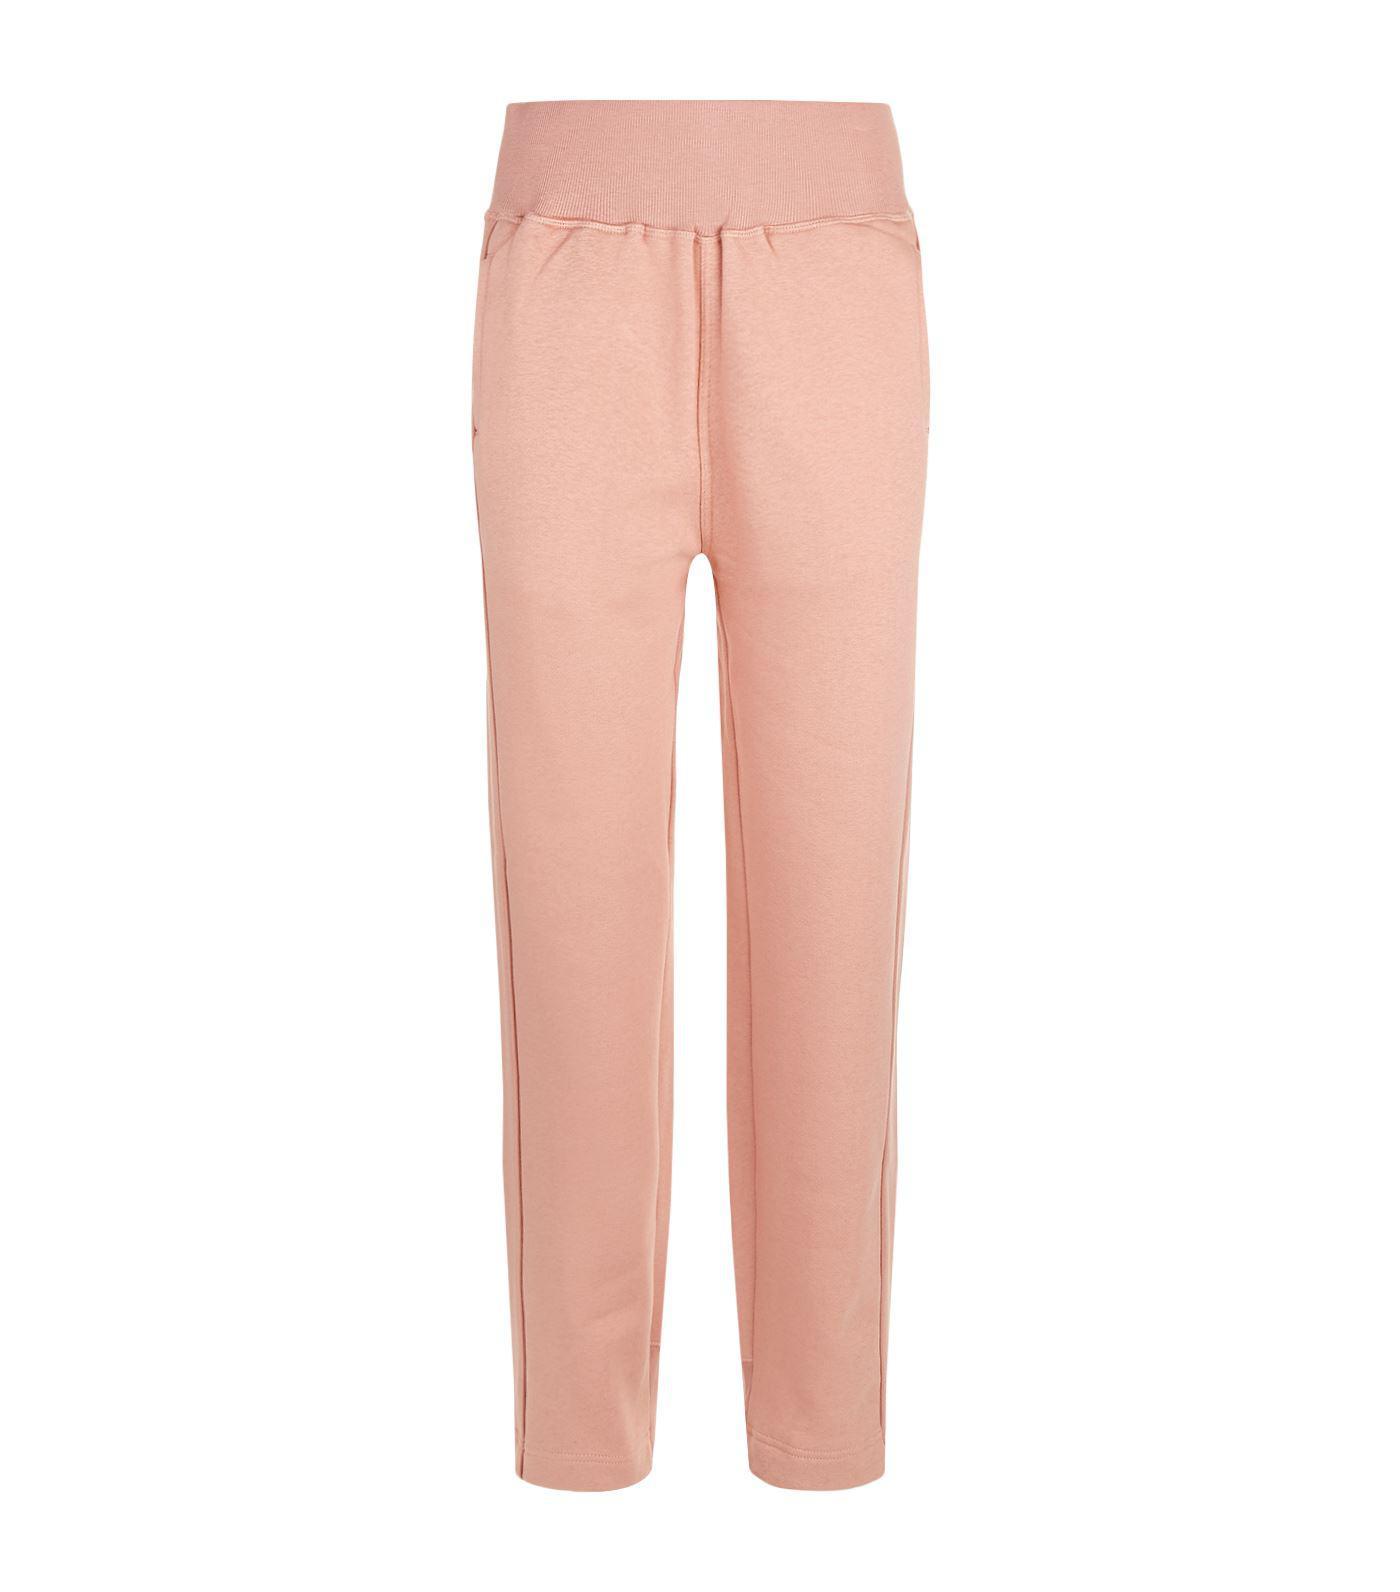 01b08f96b99c60 adidas By Stella McCartney Comfort Sweatpants in Pink - Lyst